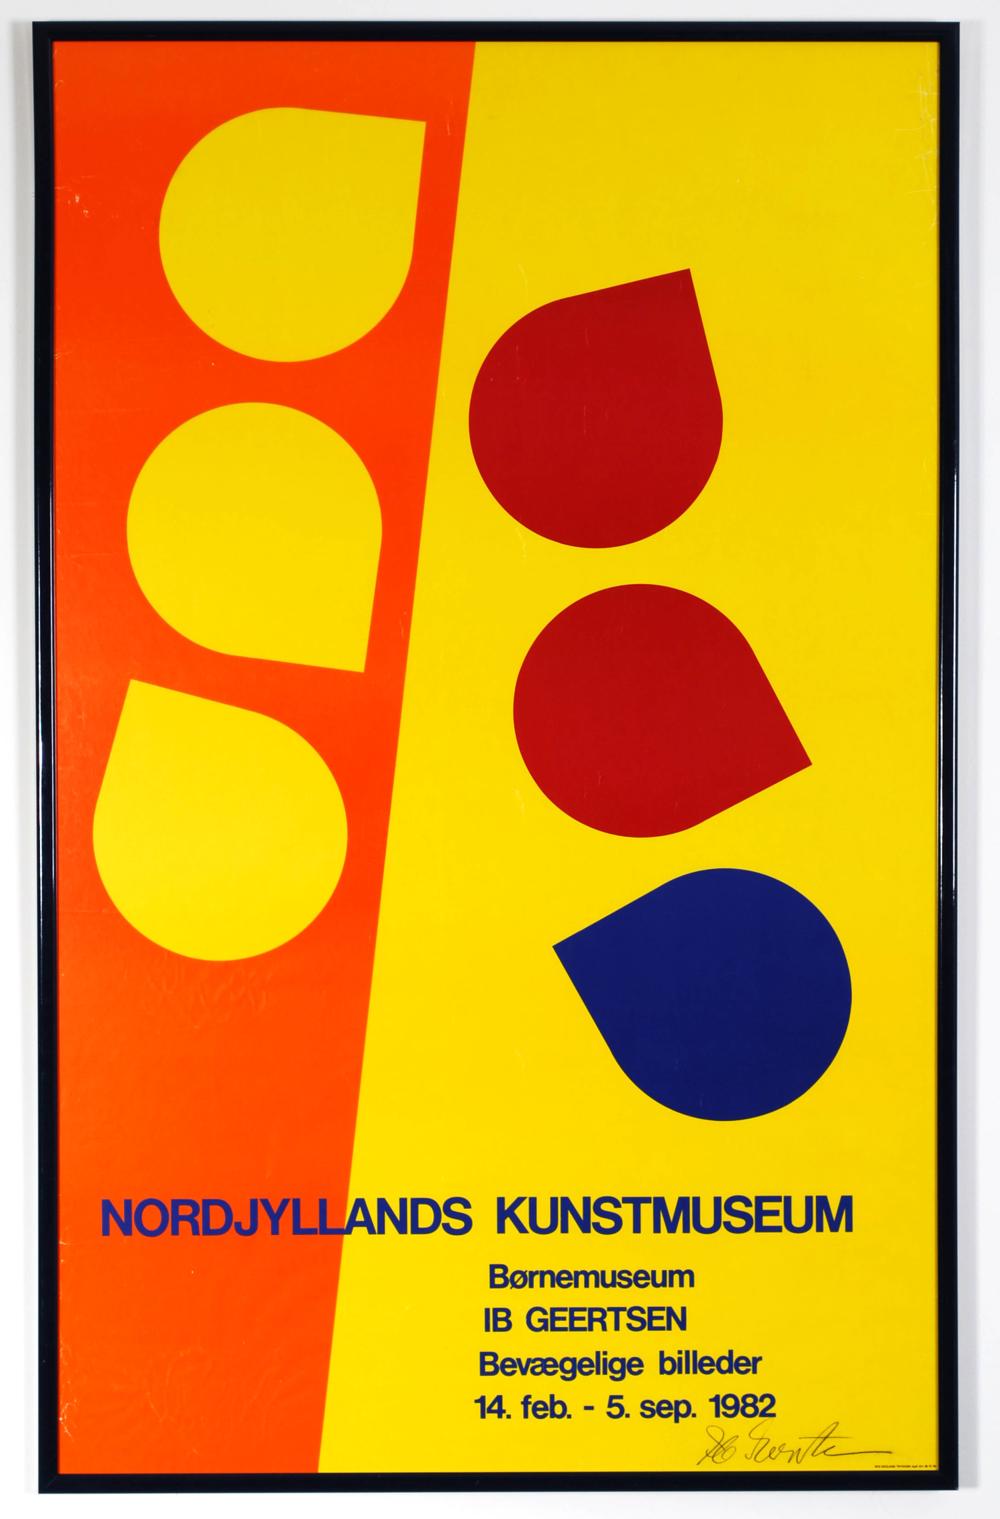 Original poster Ib Geersten - Bevaegelige billeder - Nordjyllands Kunstmuseum - Aalborg Denmark - 1982- (signed by auth  or)  - AVAILABLE